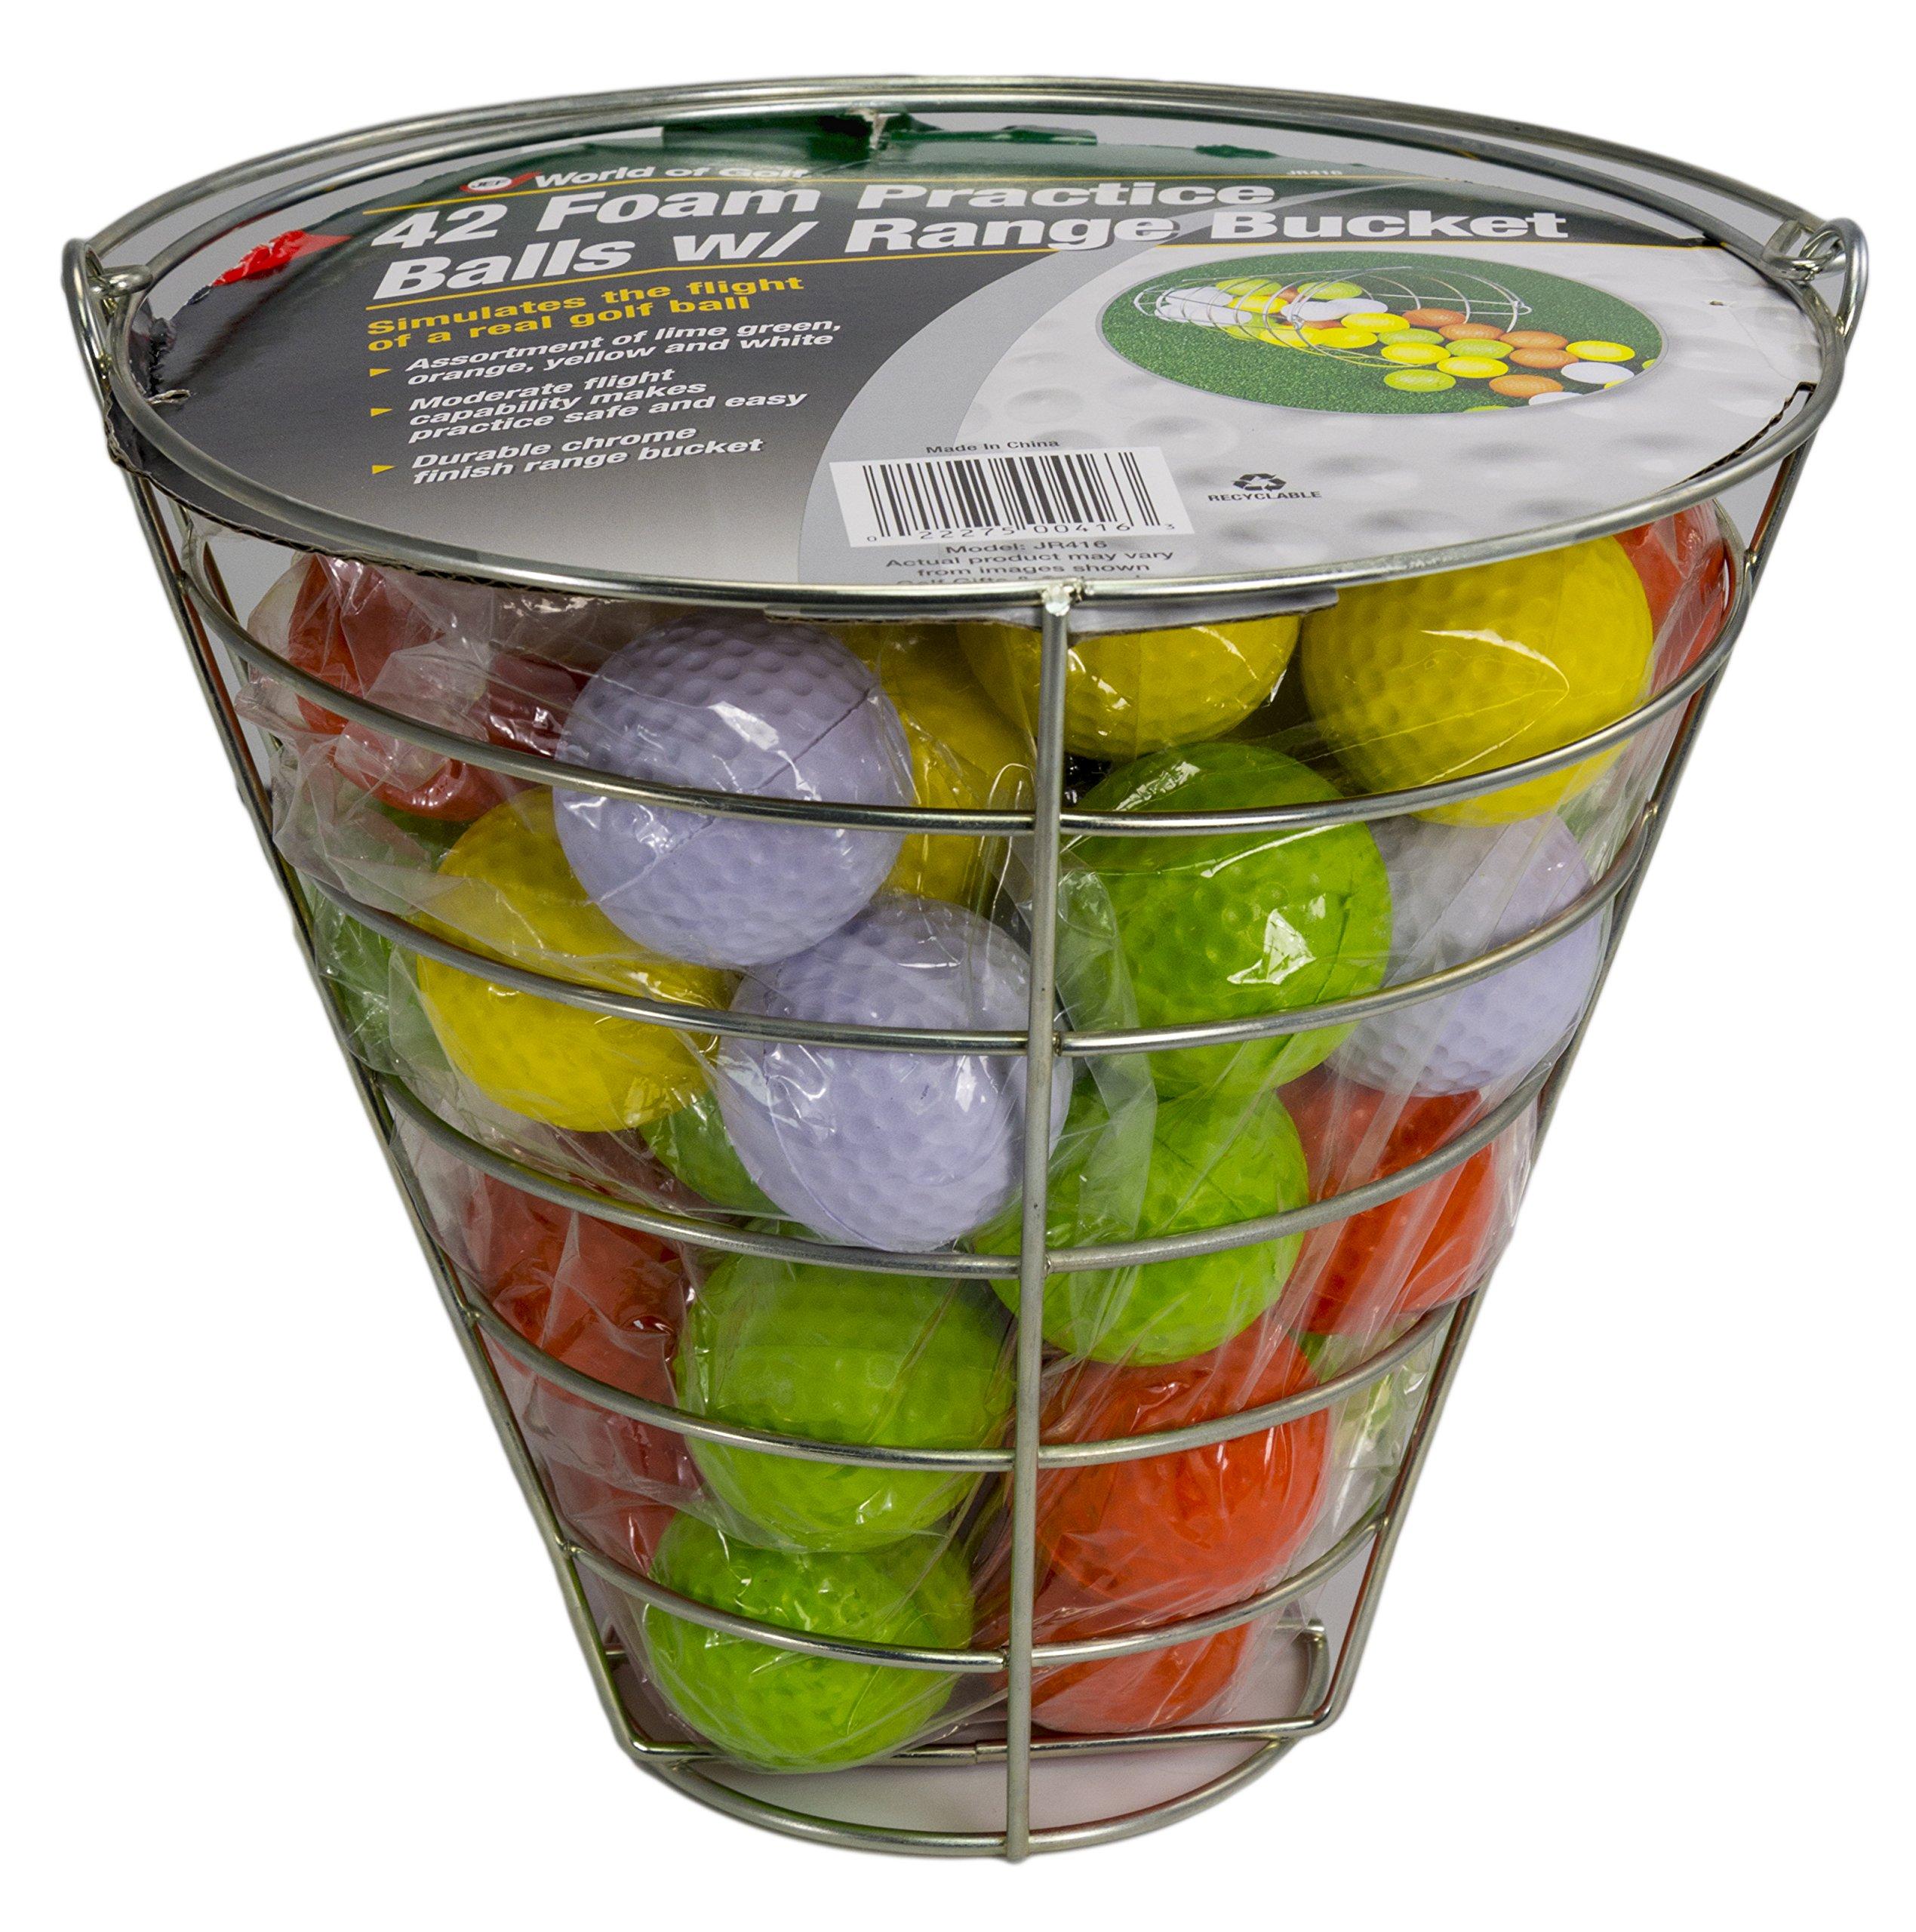 Jef World of Golf Foam Practice Balls (42 Multi-Colored Balls) by JEF WORLD OF GOLF